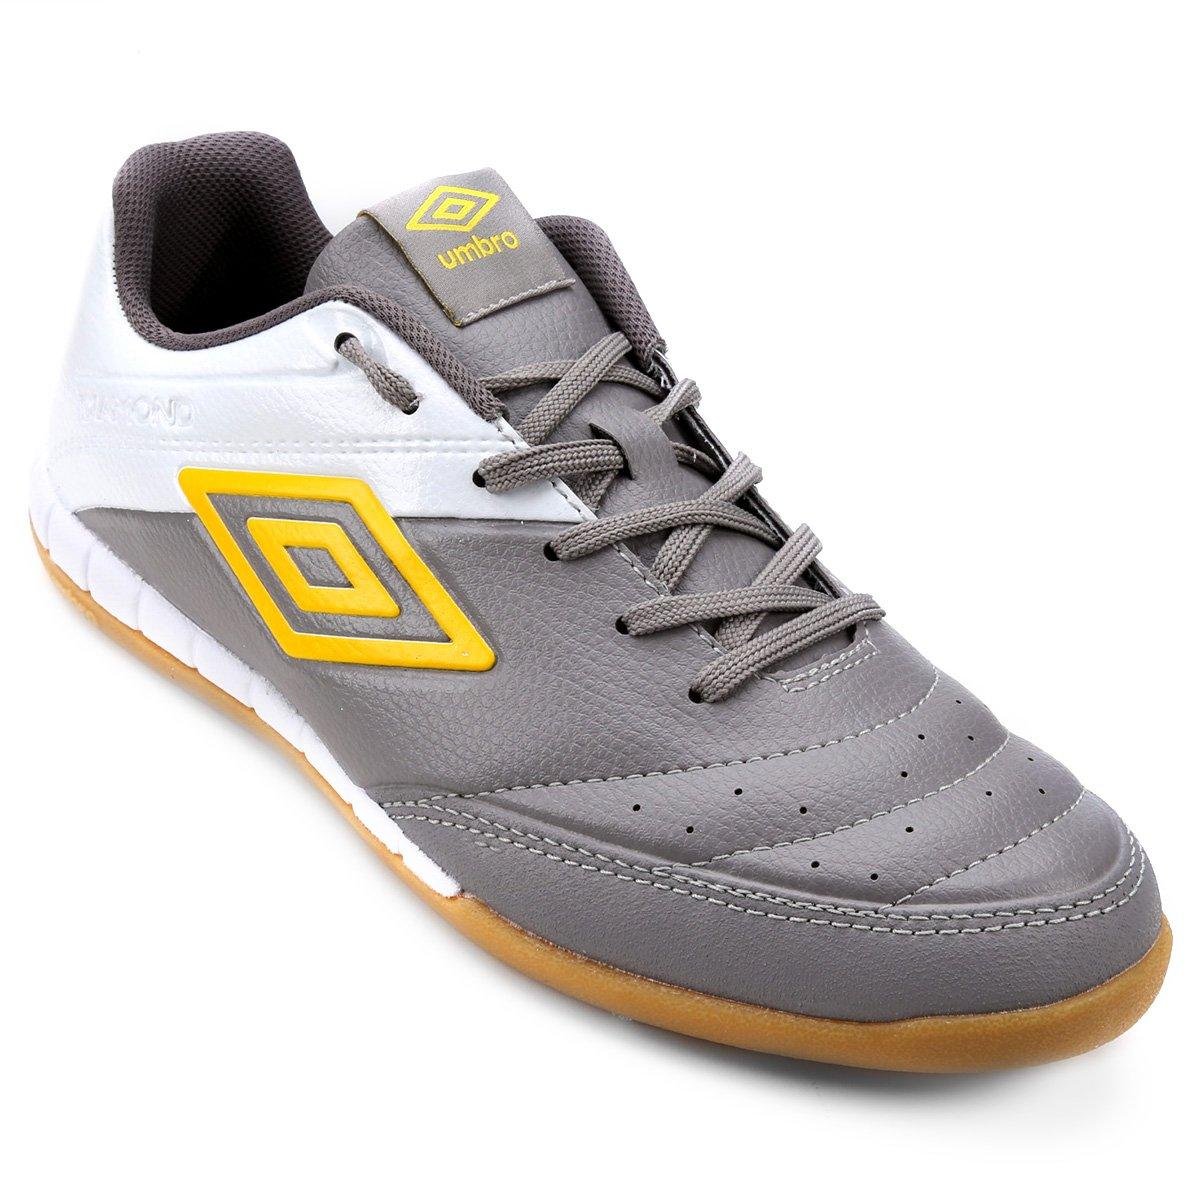 9ed3c27bf5cea Chuteira Futsal Umbro Diamond 2 - Compre Agora